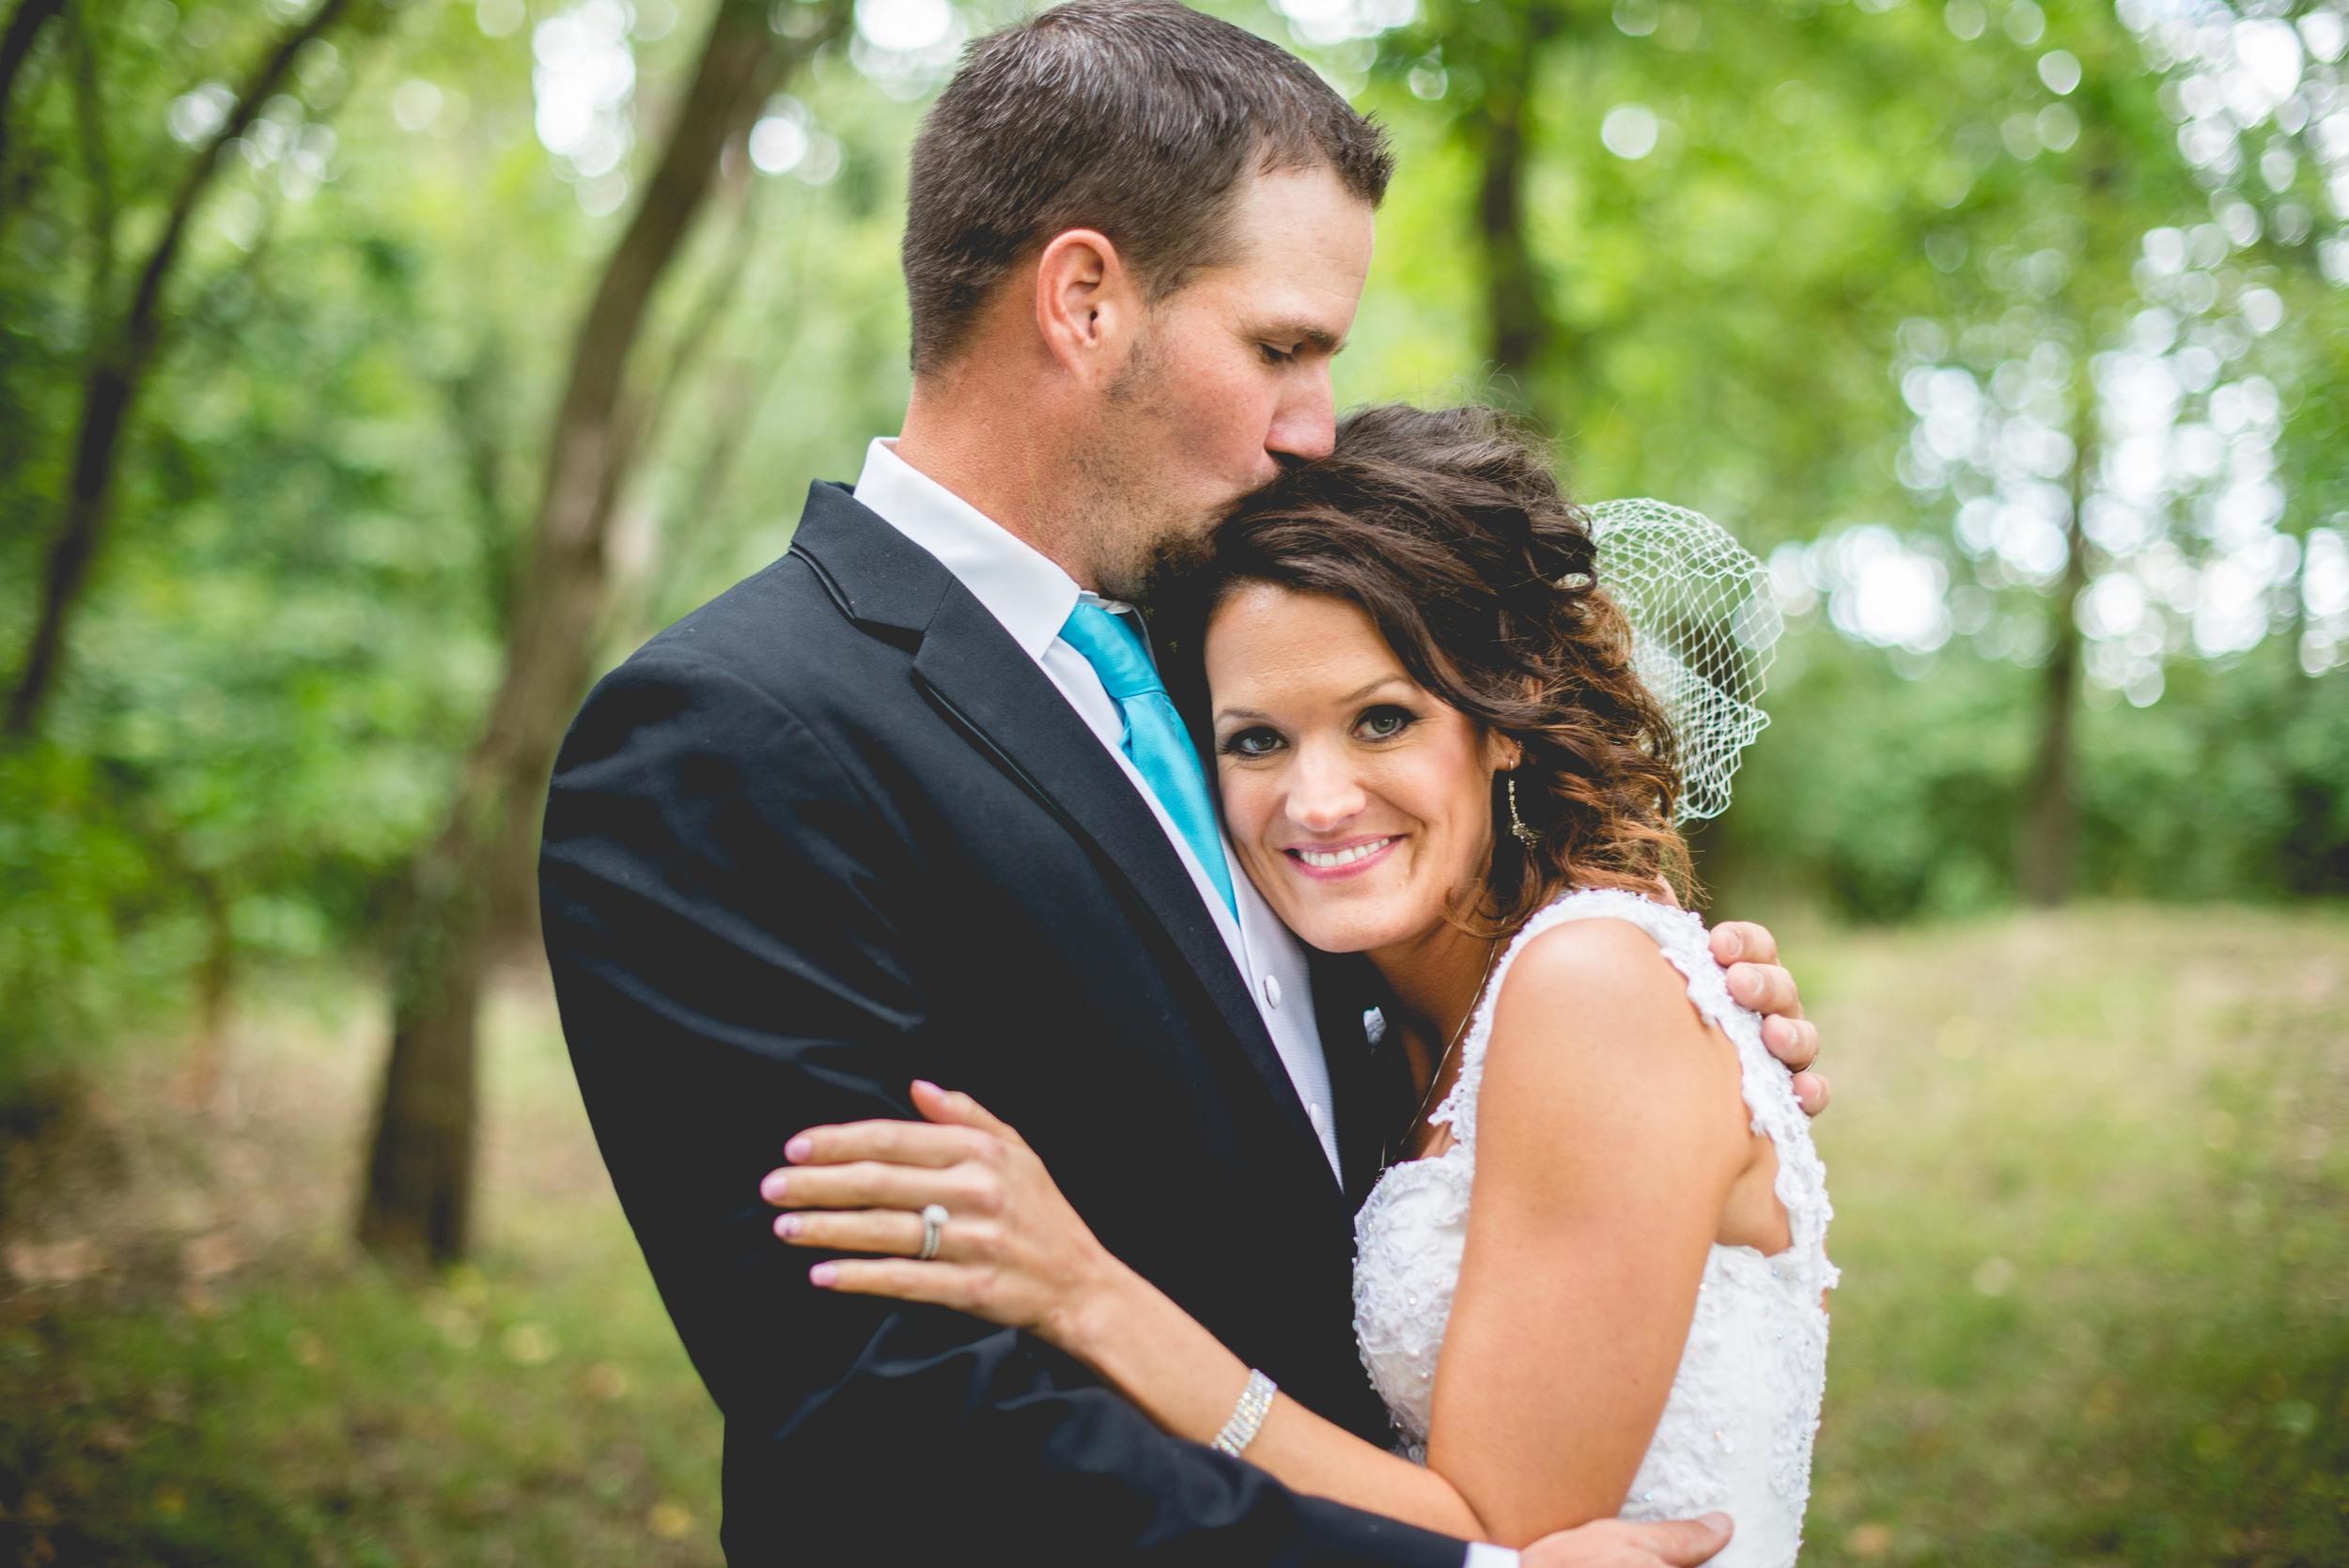 sarasutterphotography_wedding_charlieandkayla_2015-955.jpg